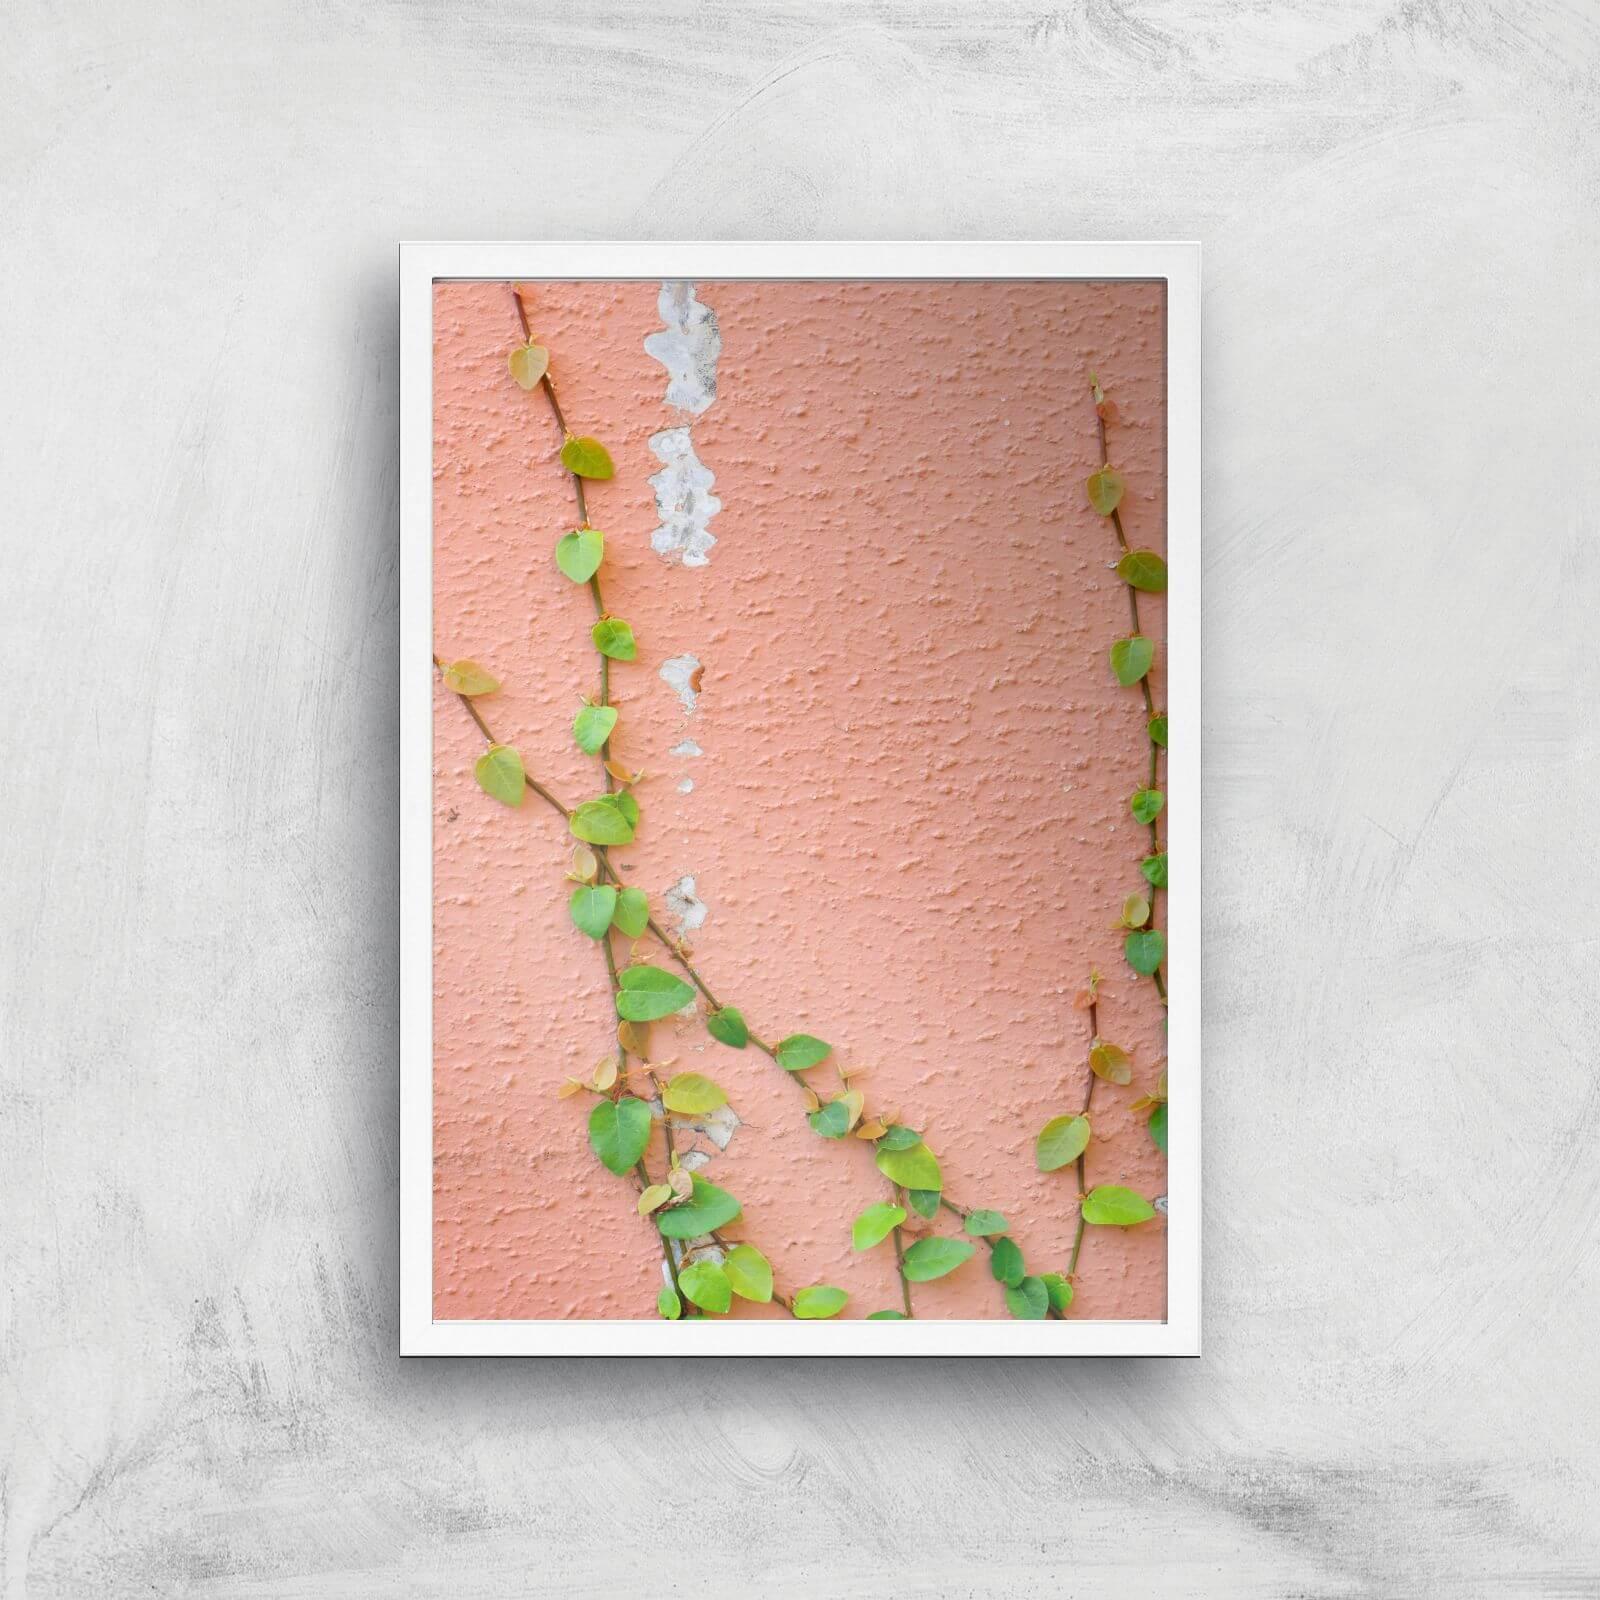 Climbing Ivy Giclee Art Print   A2   White Frame